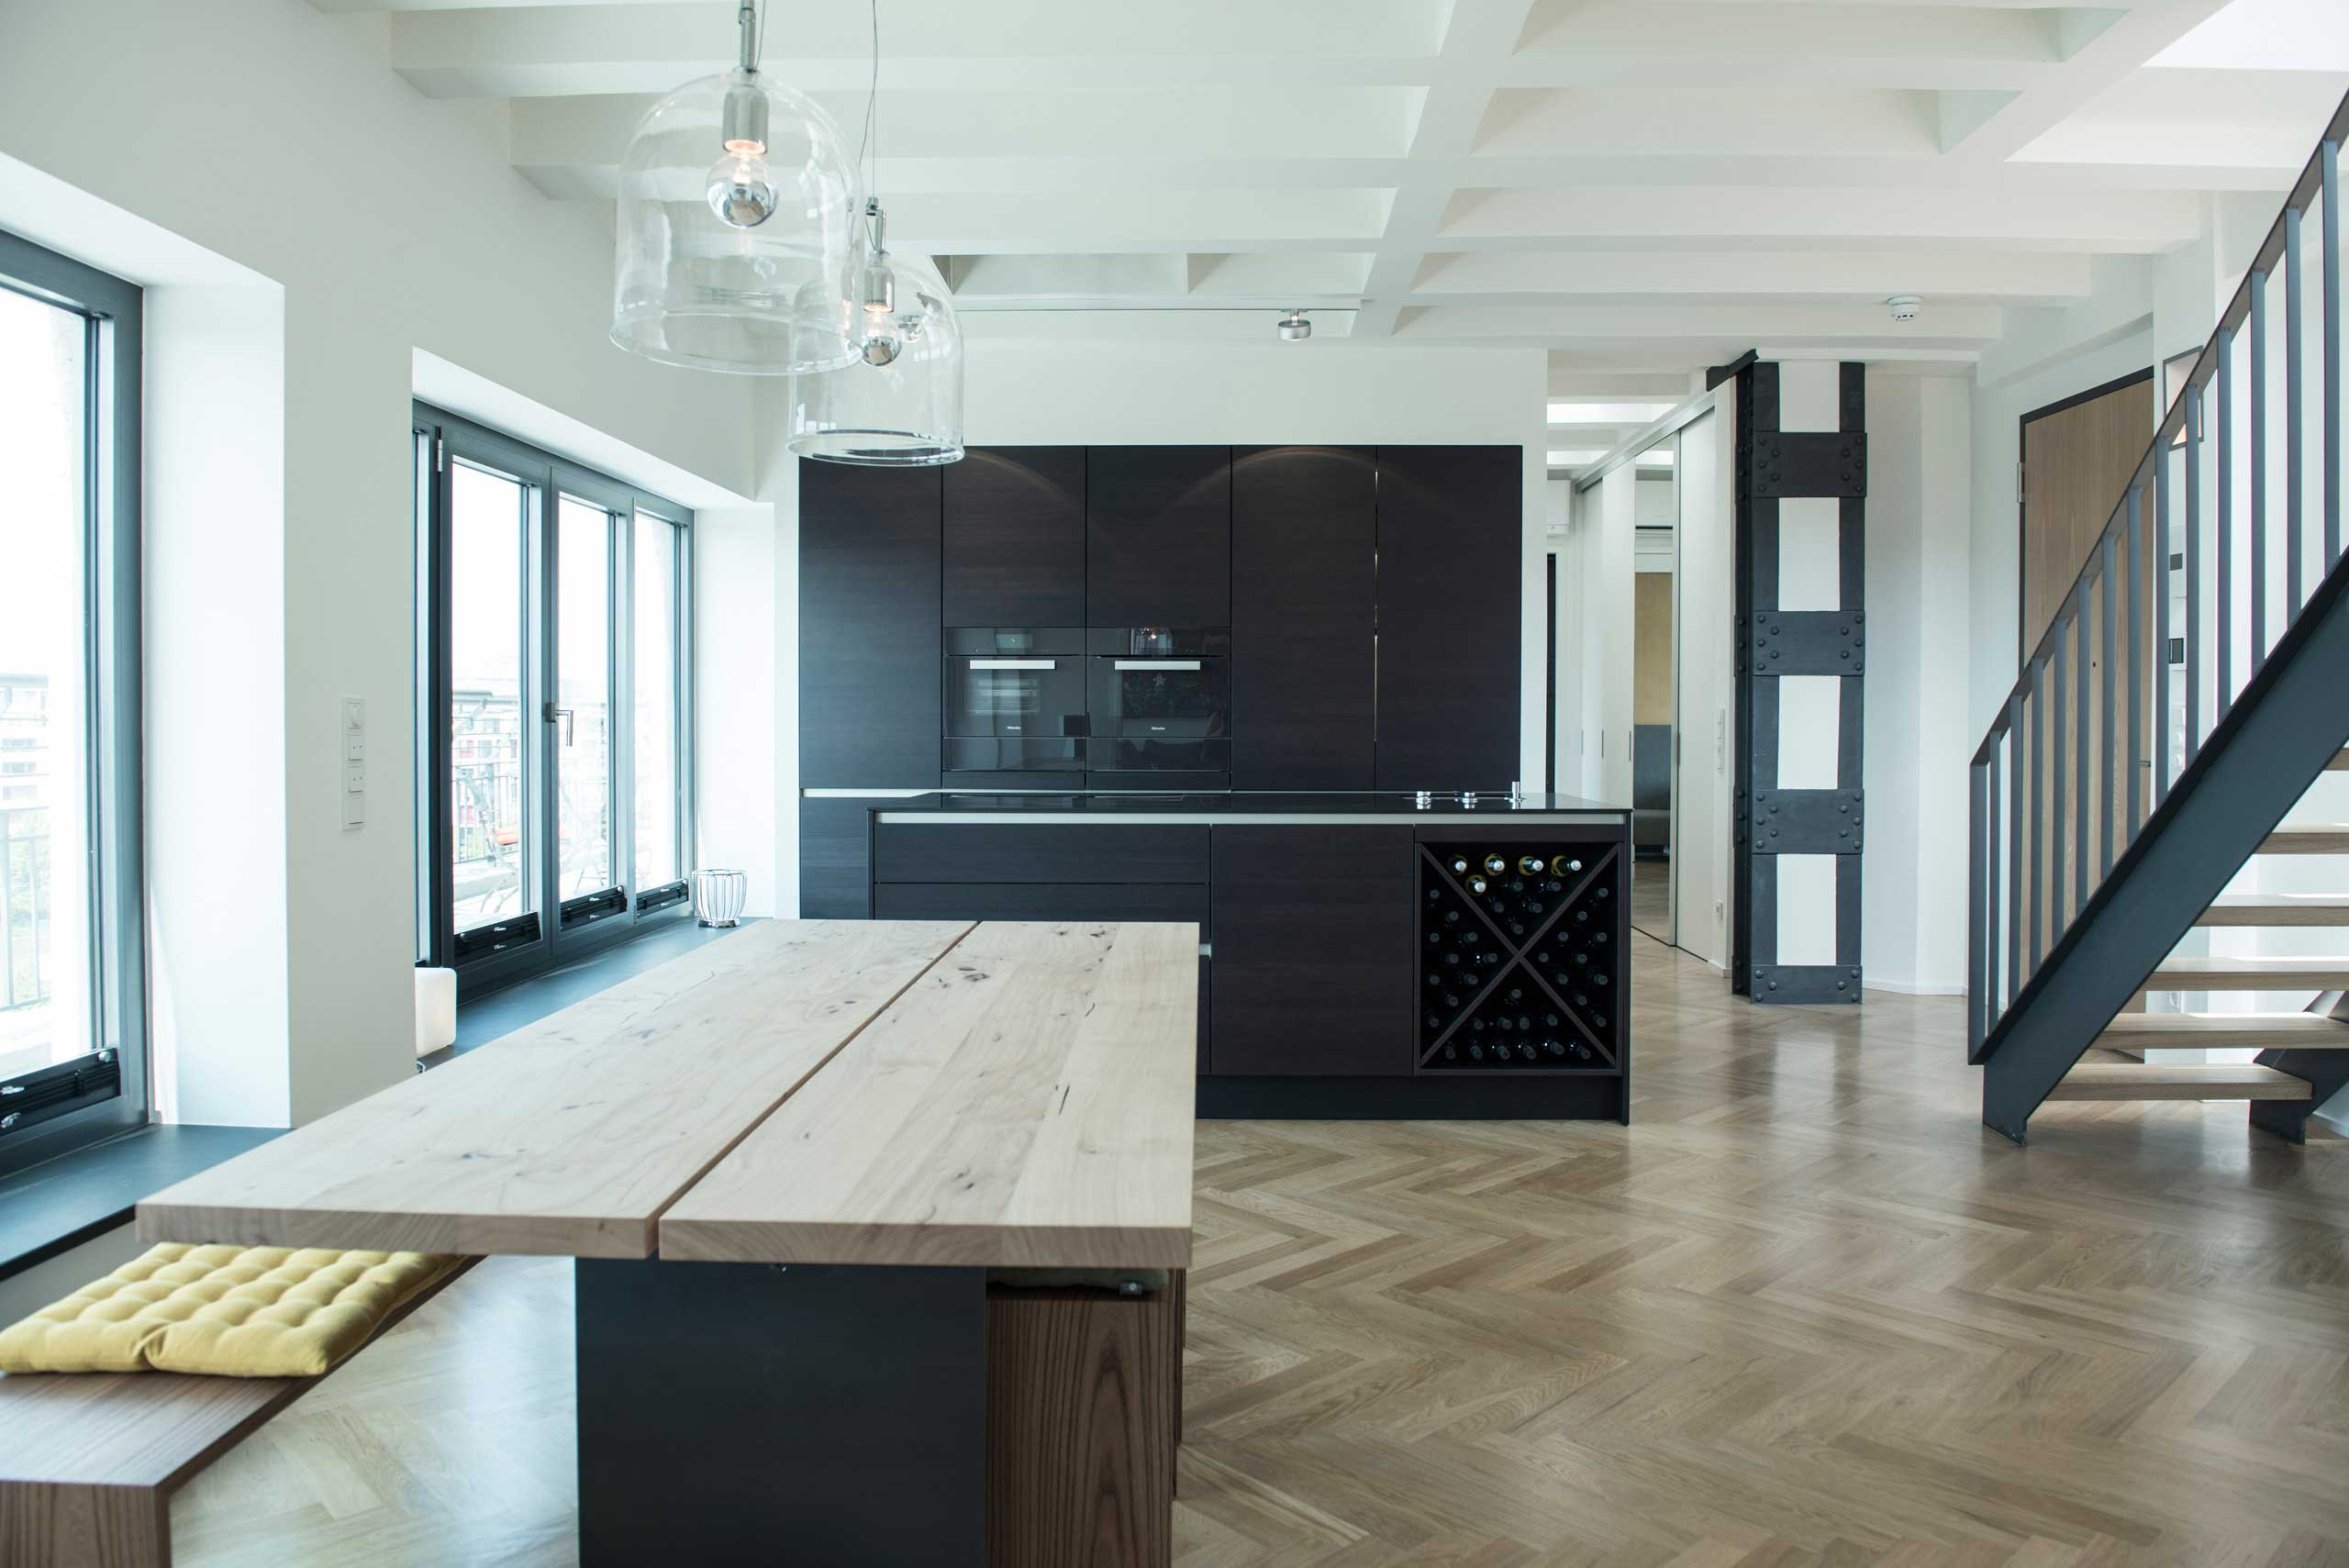 suites und high class apartments berlin. Black Bedroom Furniture Sets. Home Design Ideas